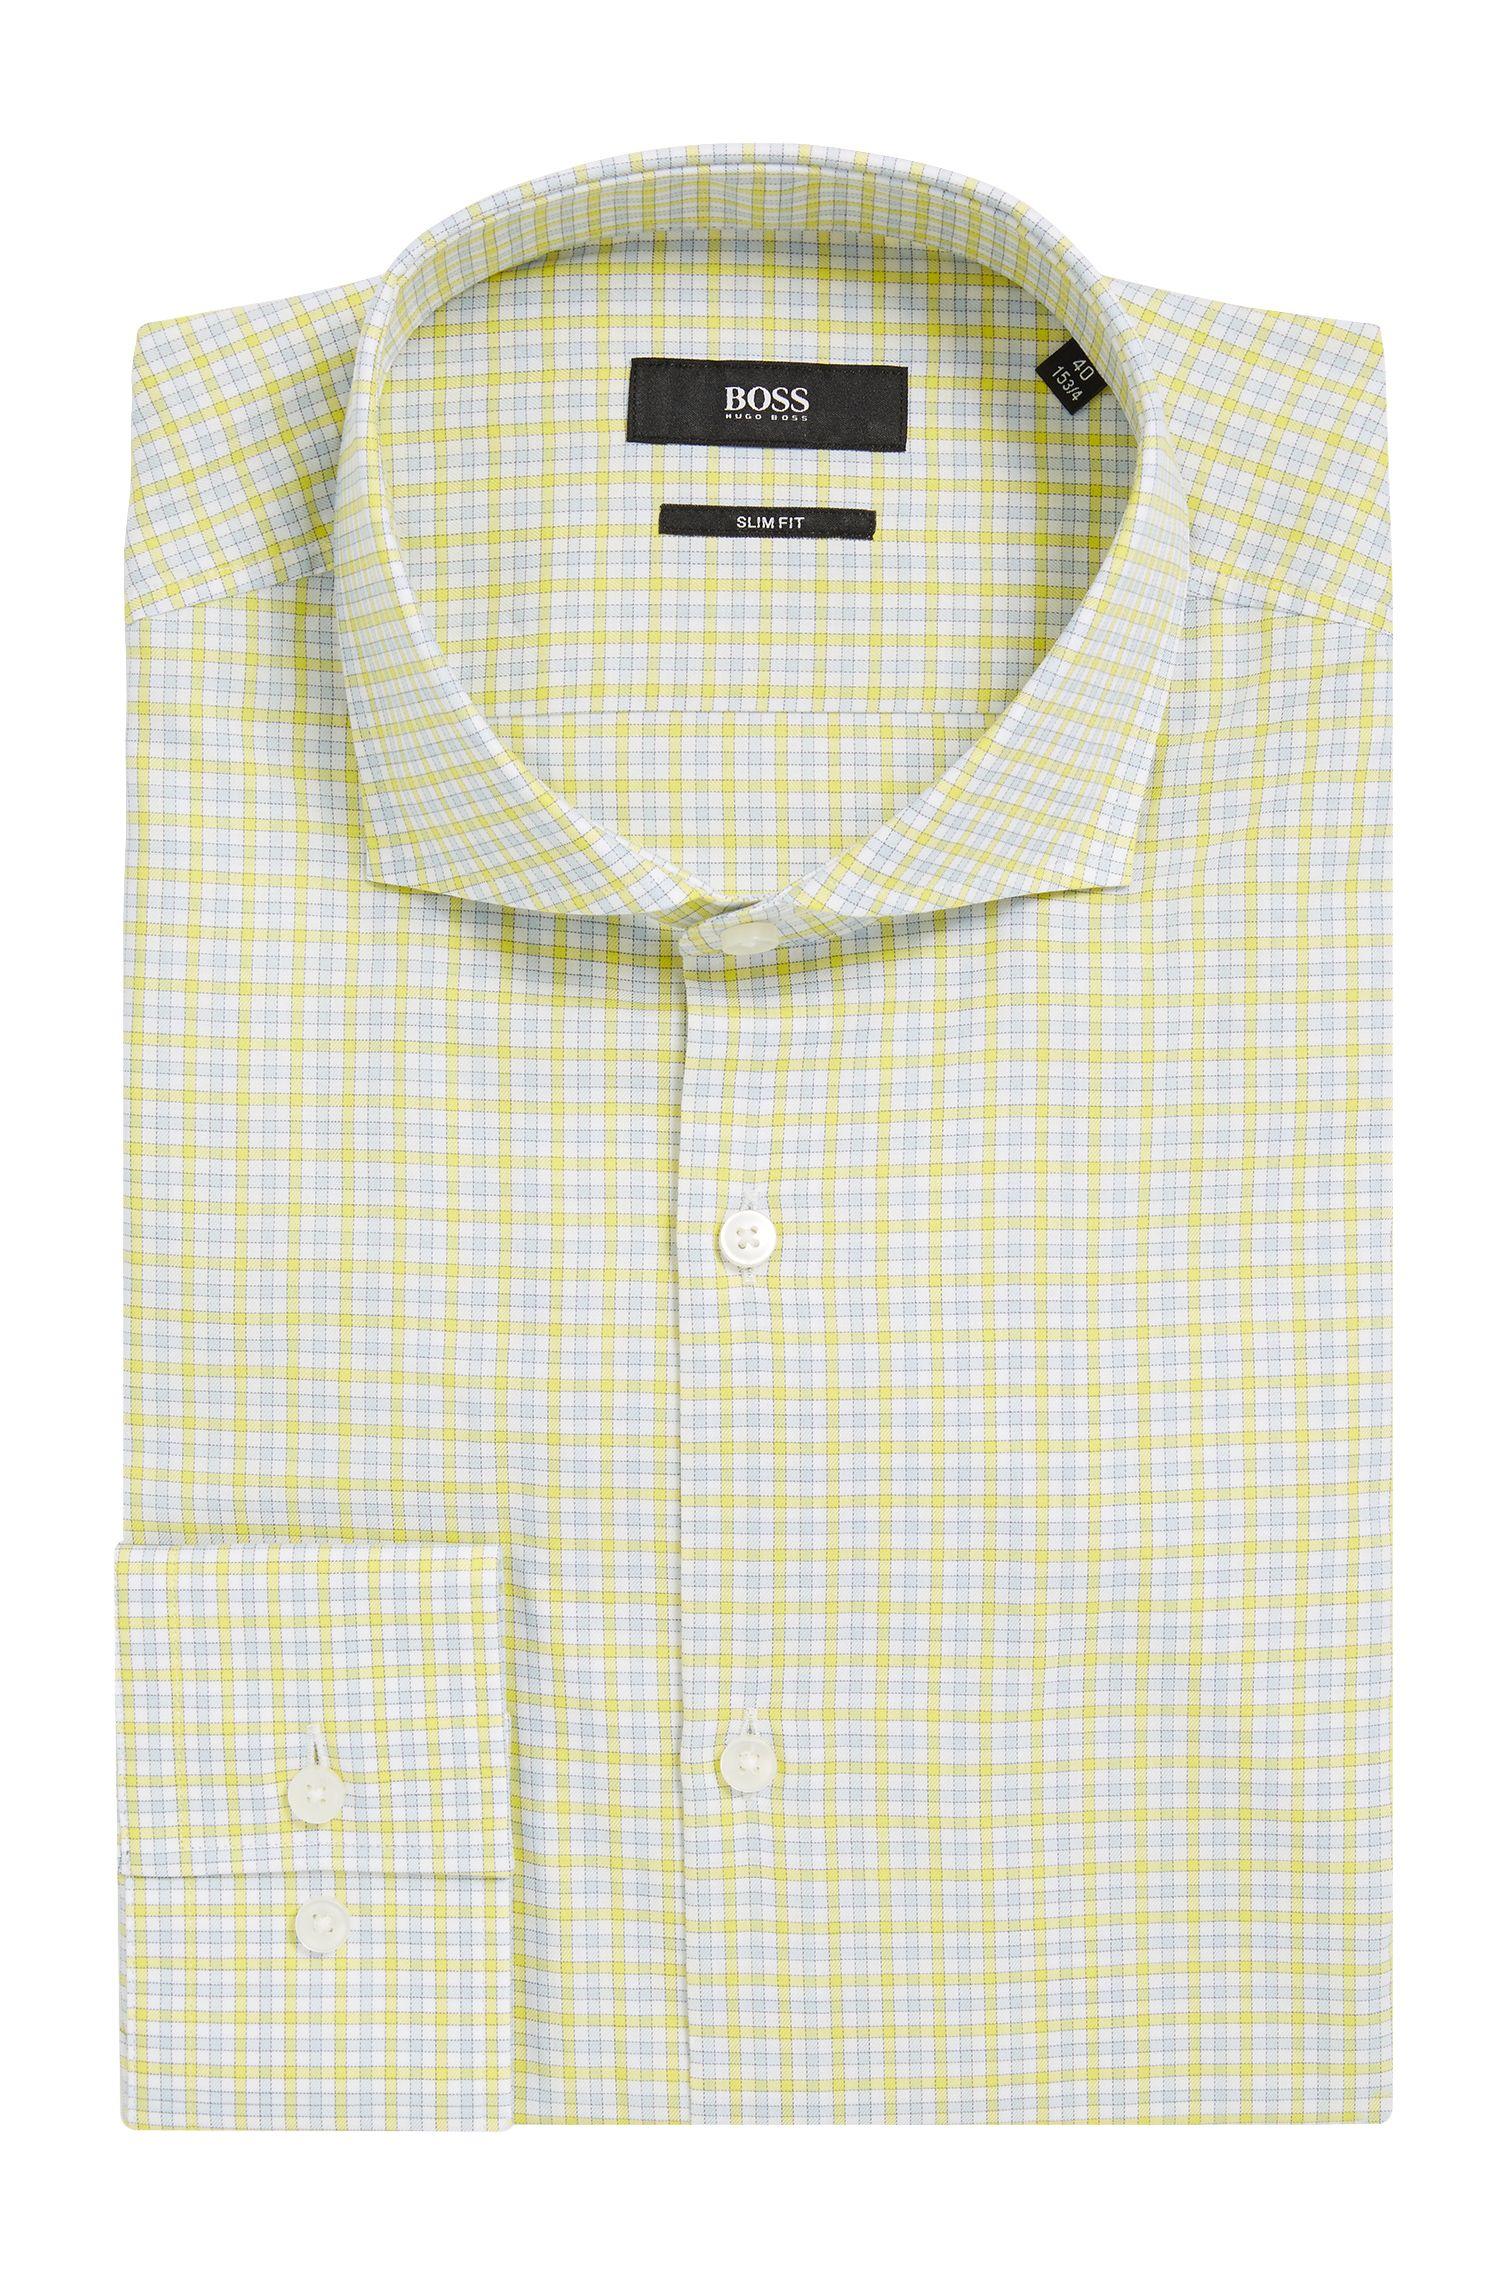 Checked Cotton Dress Shirt, Slim Fit | Jason